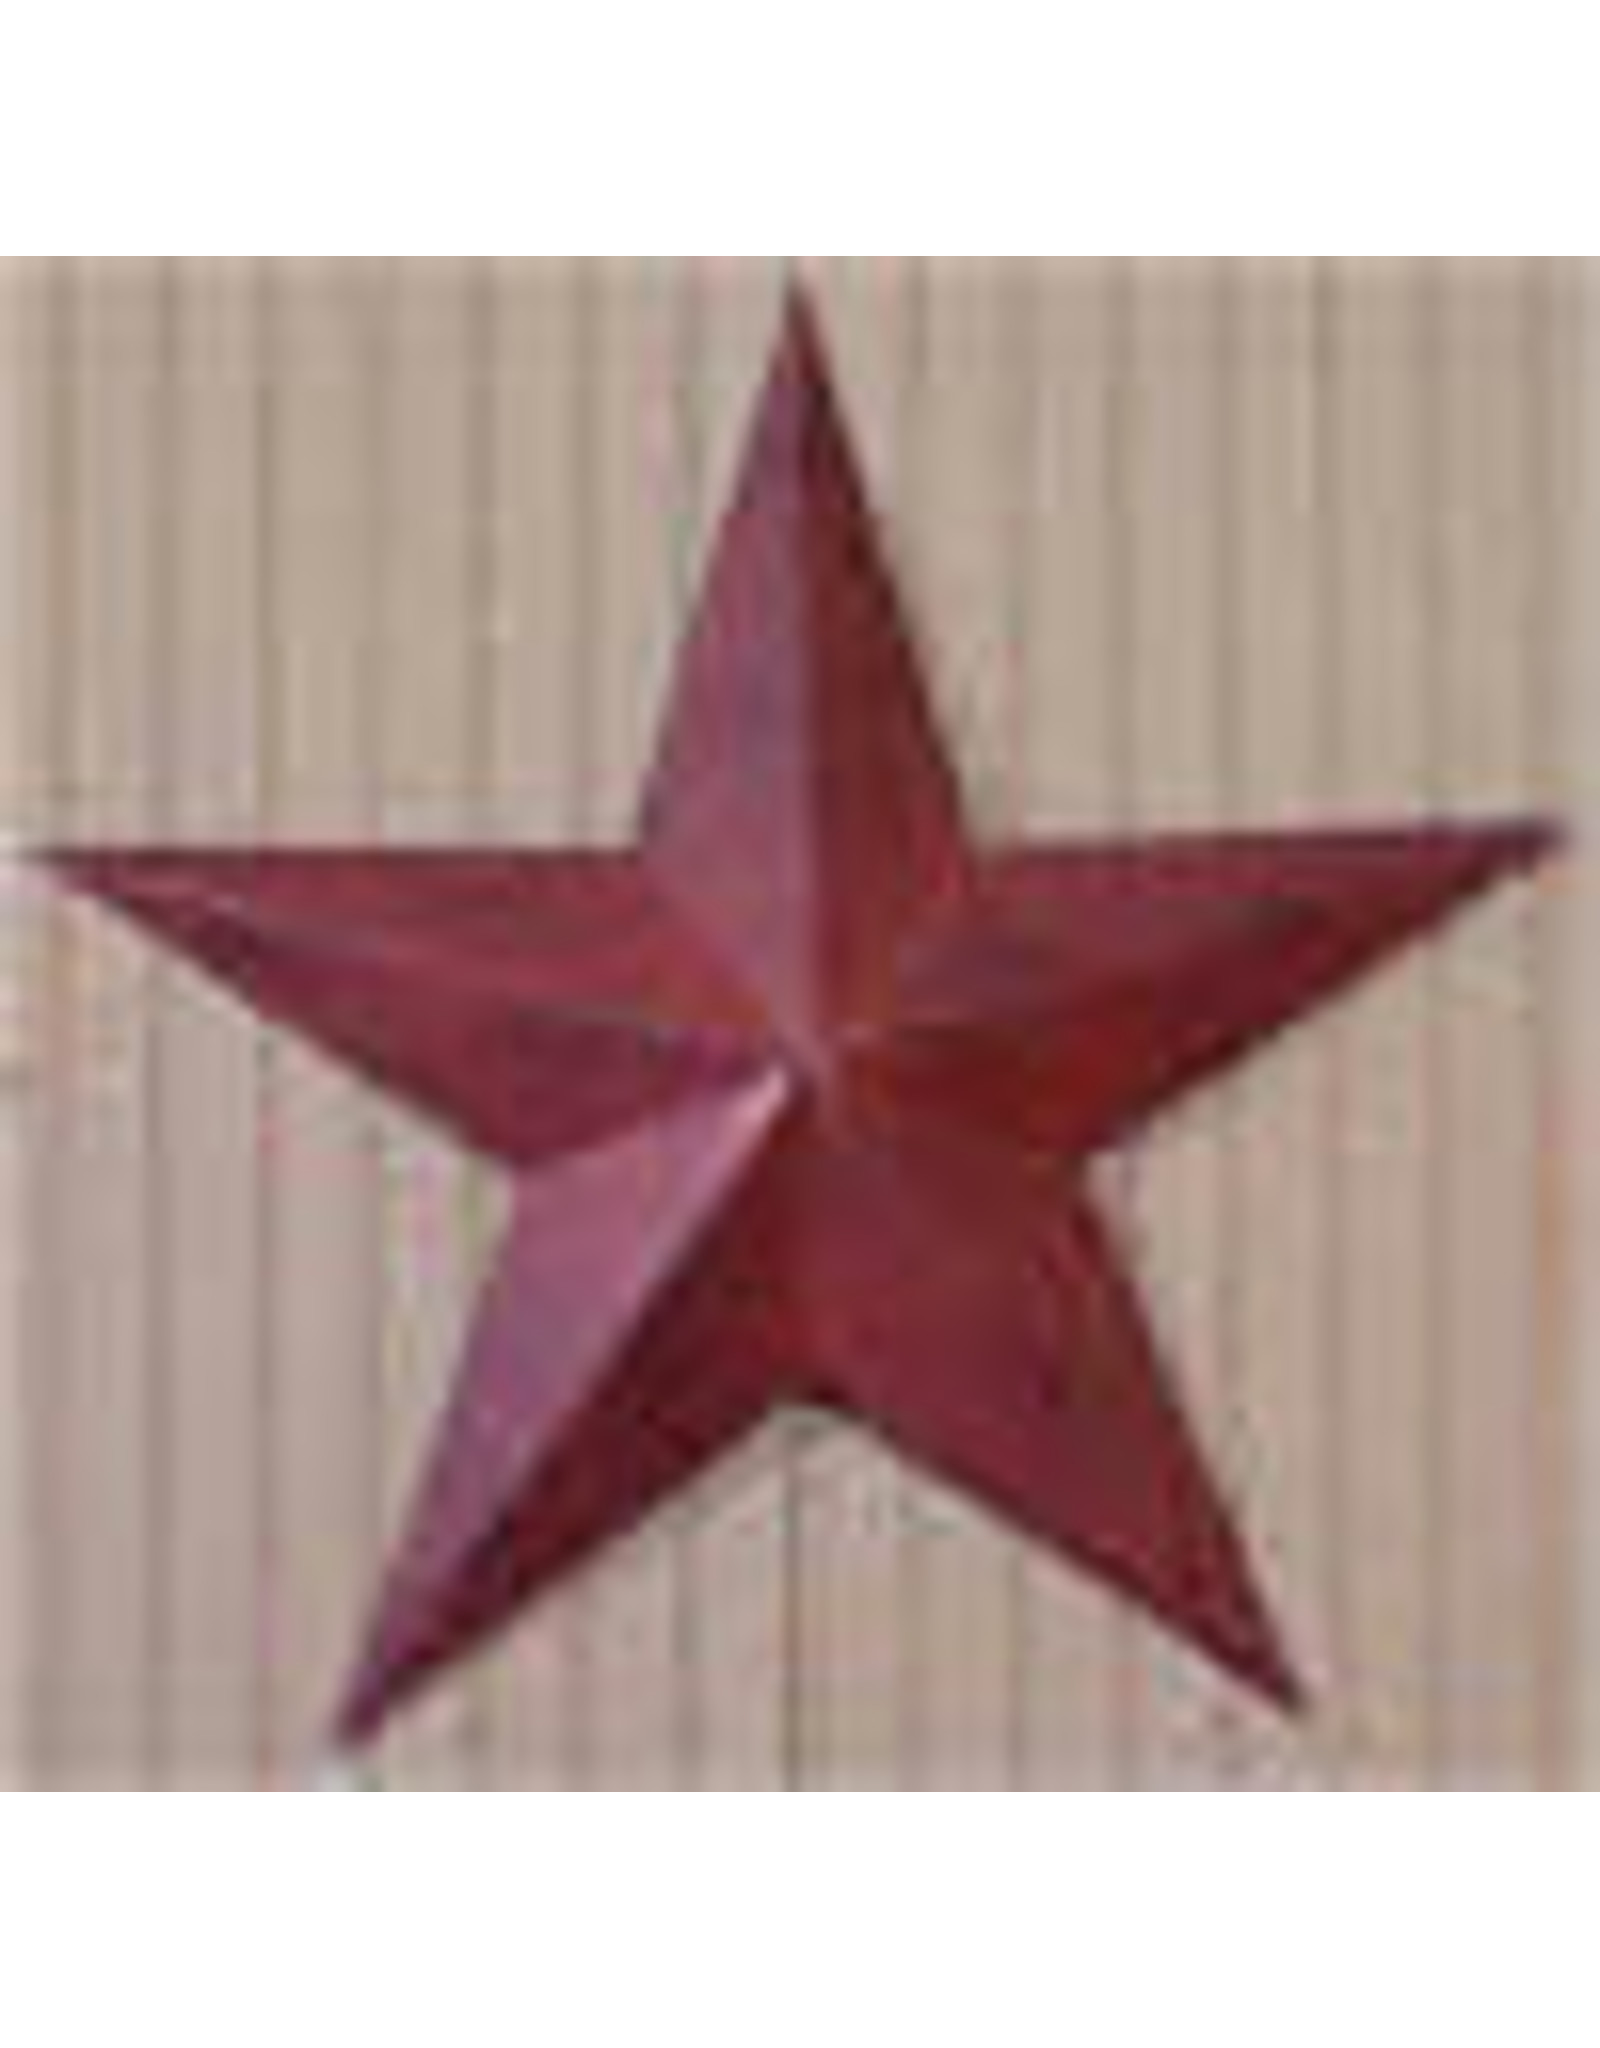 "BURGUNDY RUSTY BARN STAR 3.5"""